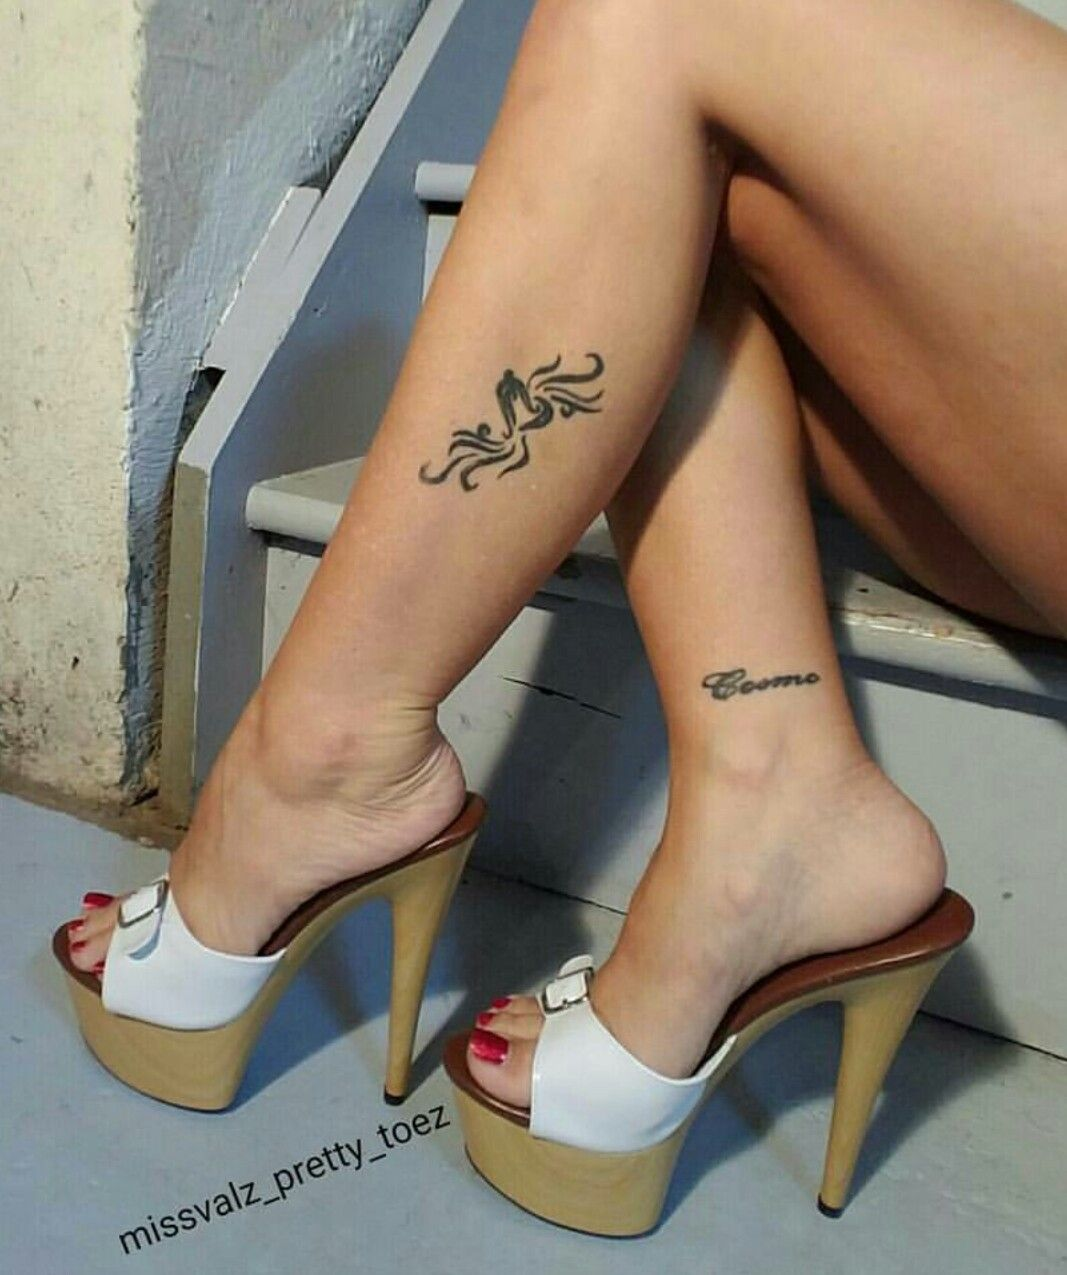 Clear Shoes High Heels Milf